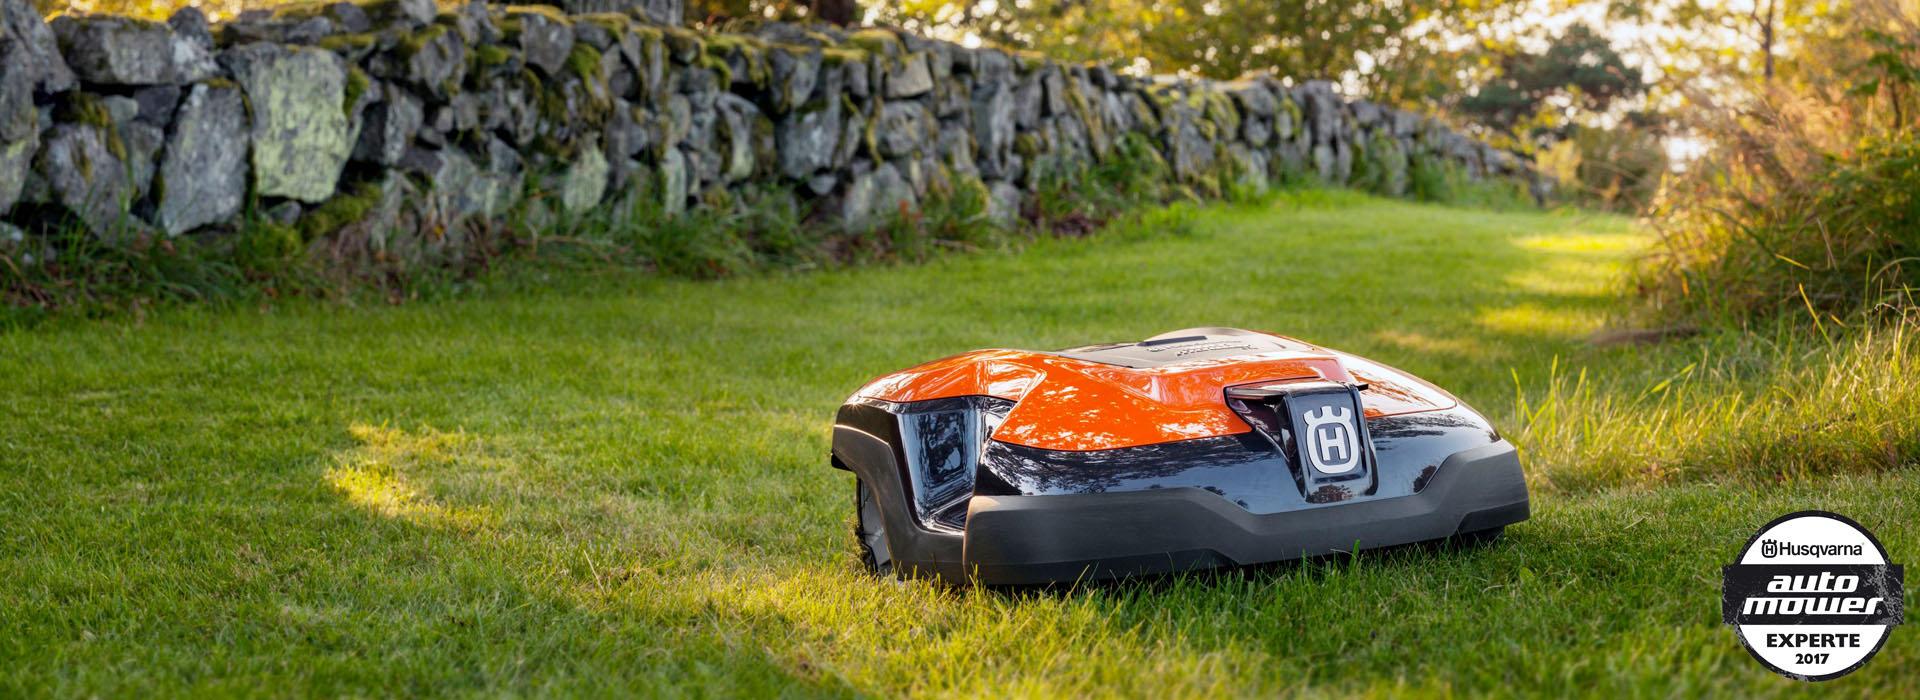 Boerger-Motorgerate-Rasenroboter-Rasenmäher-Robomäher-Mähroboter-Automower-im-Einsatz-perfekter-Rasen